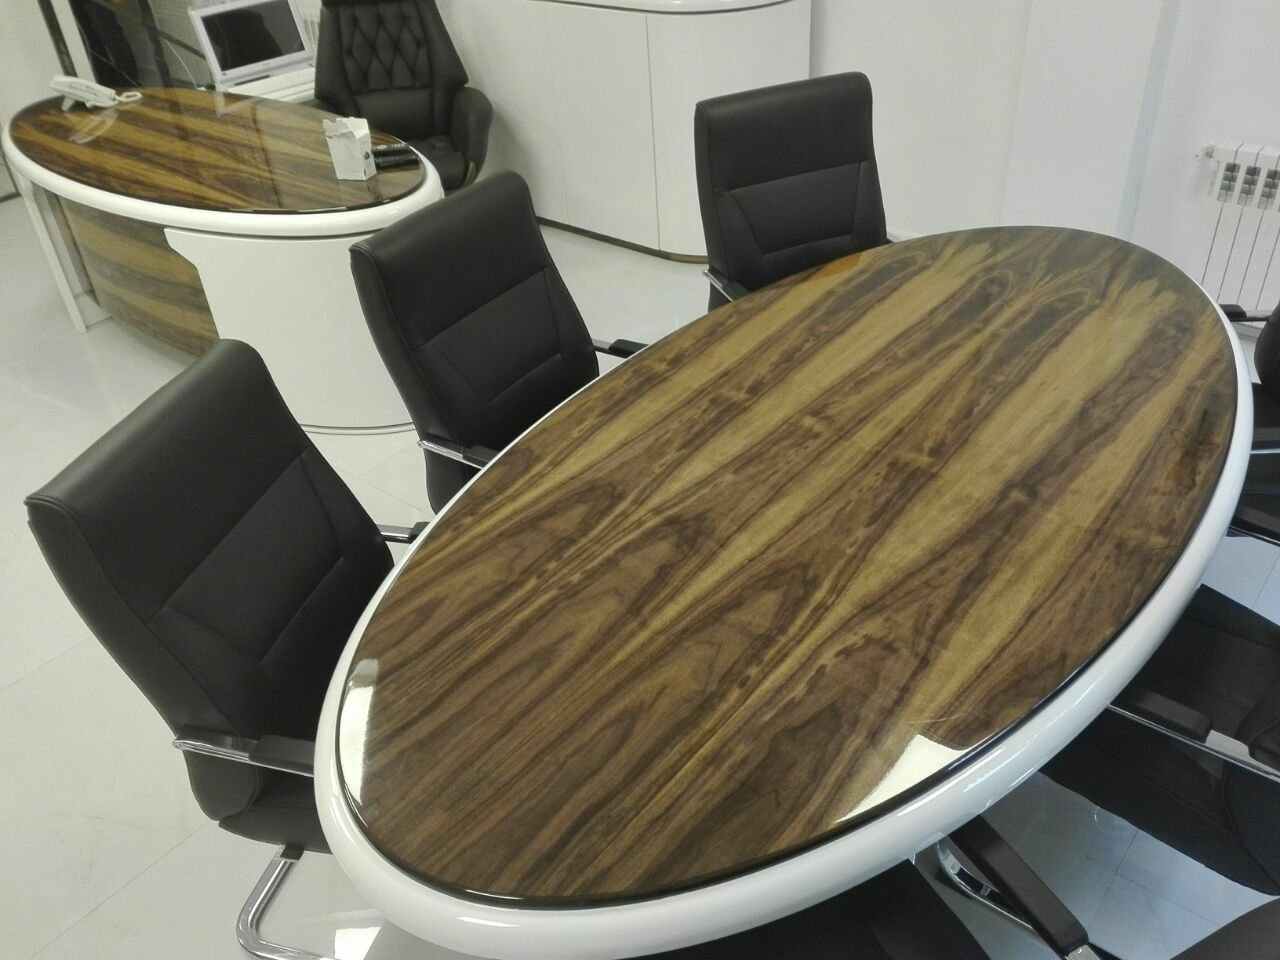 میز چوب گردو , رنگ پولیشی رستوران شاندیز